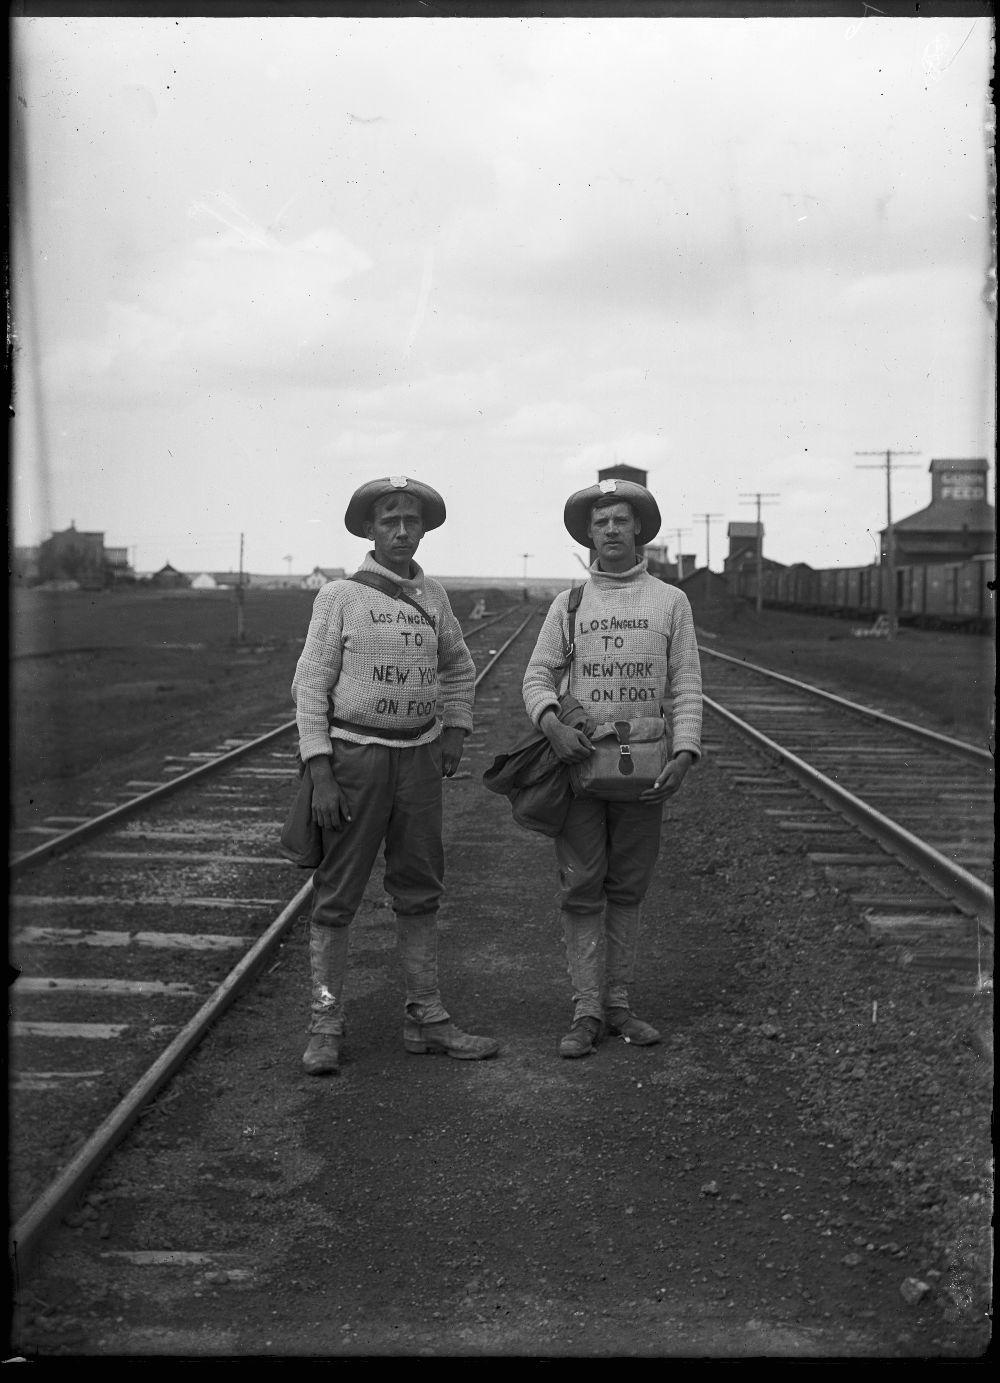 J.H. Barrett and S. Summer